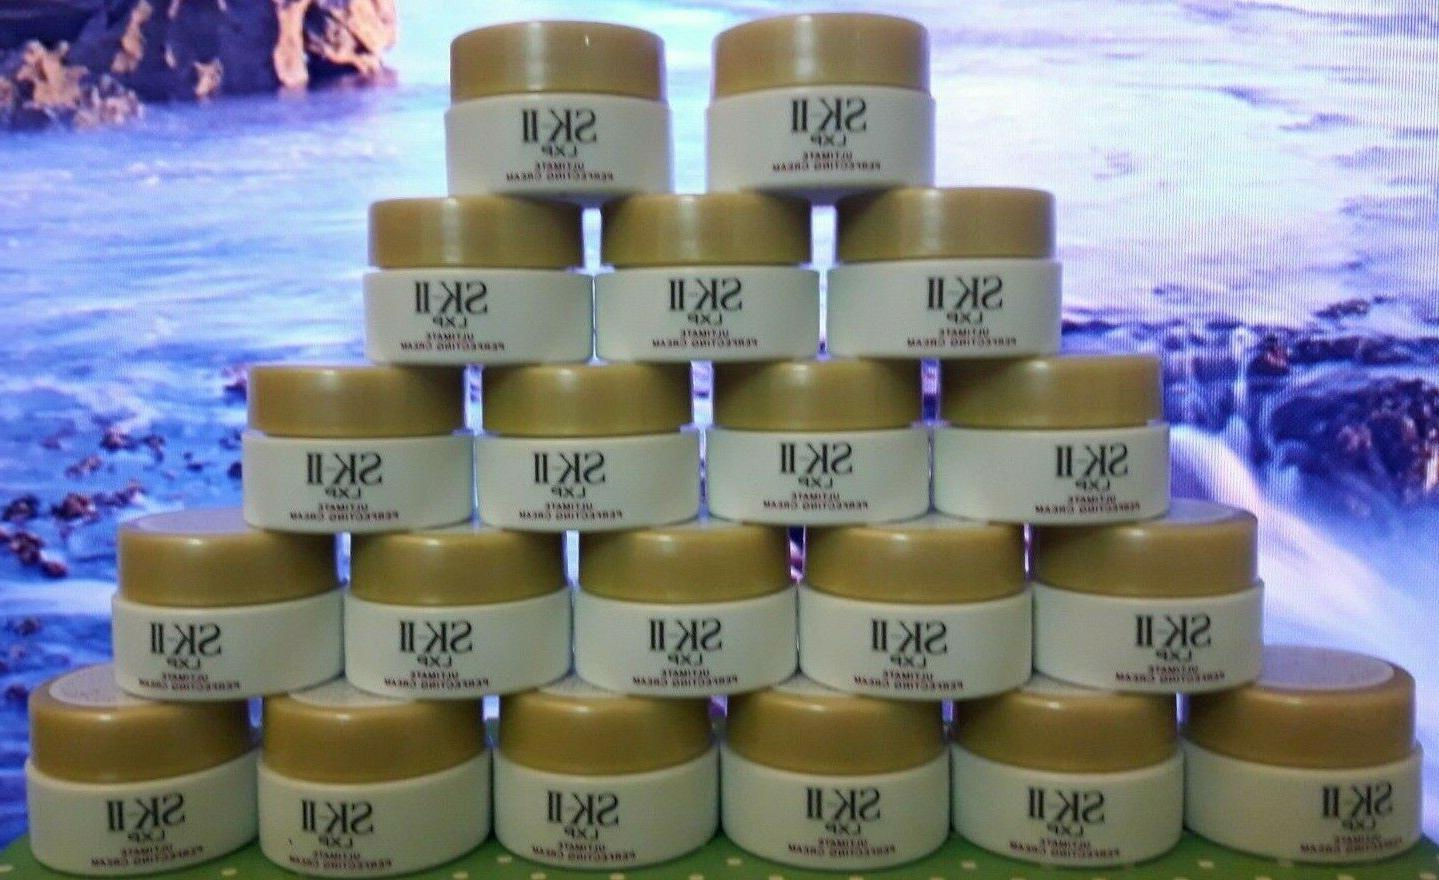 sk ii lxp ultimate perfecting cream skincare